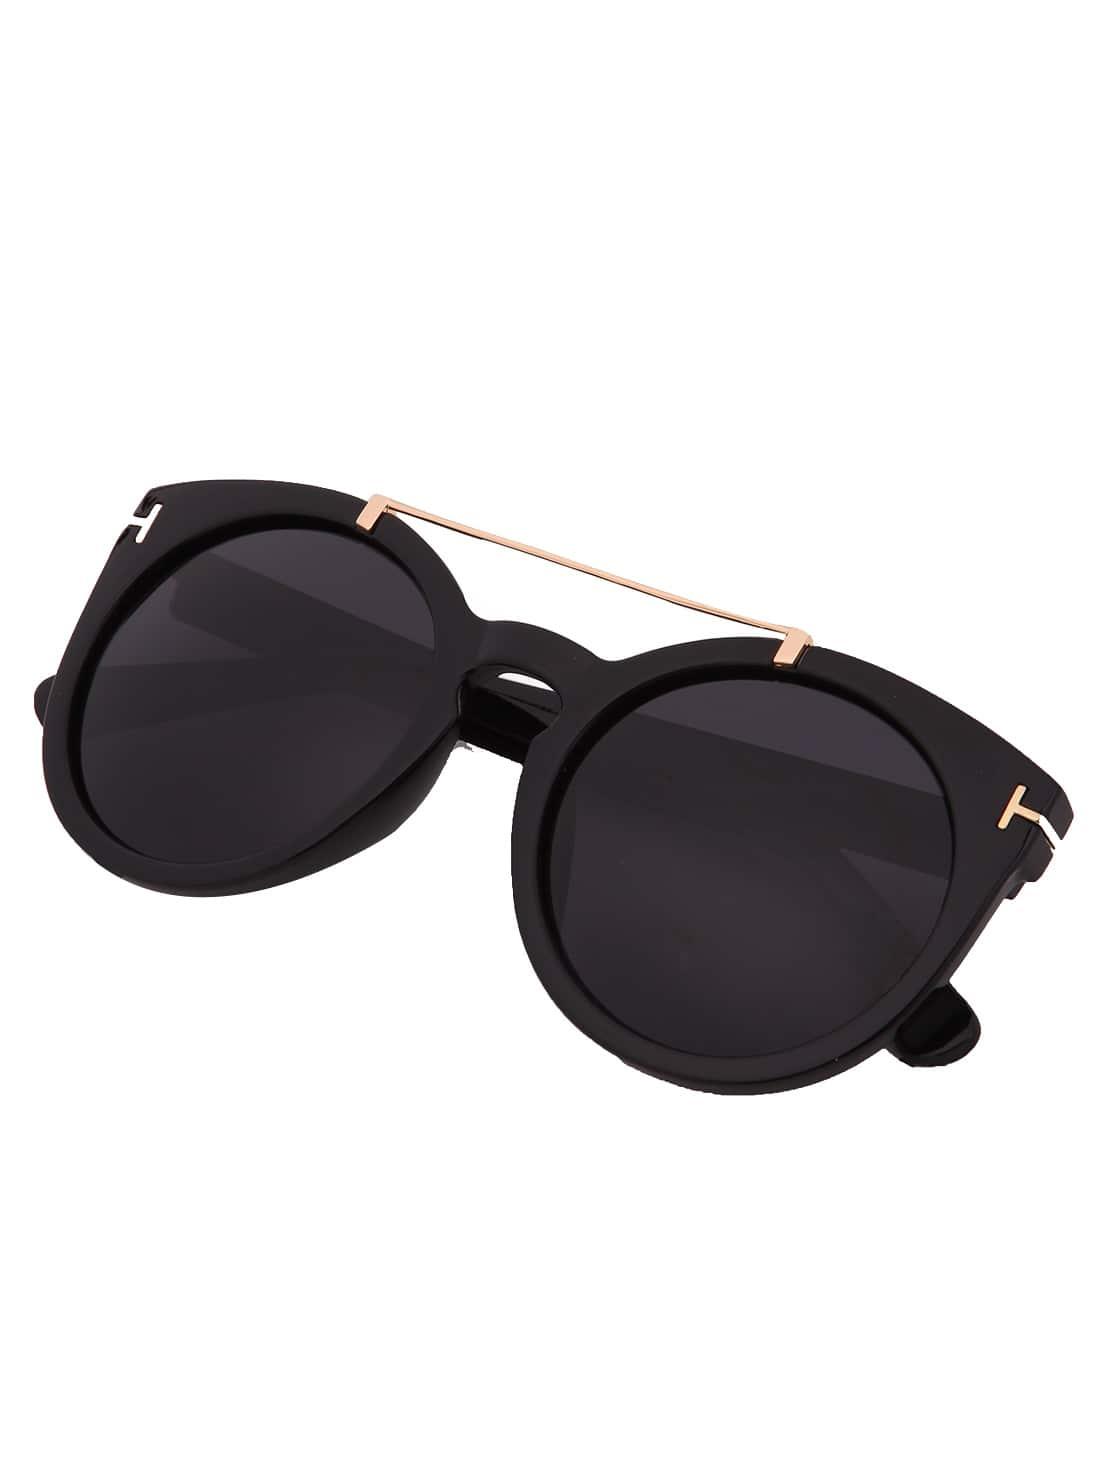 Black Lenses Top Bar Oversized Round Sunglasses -SheIn ...